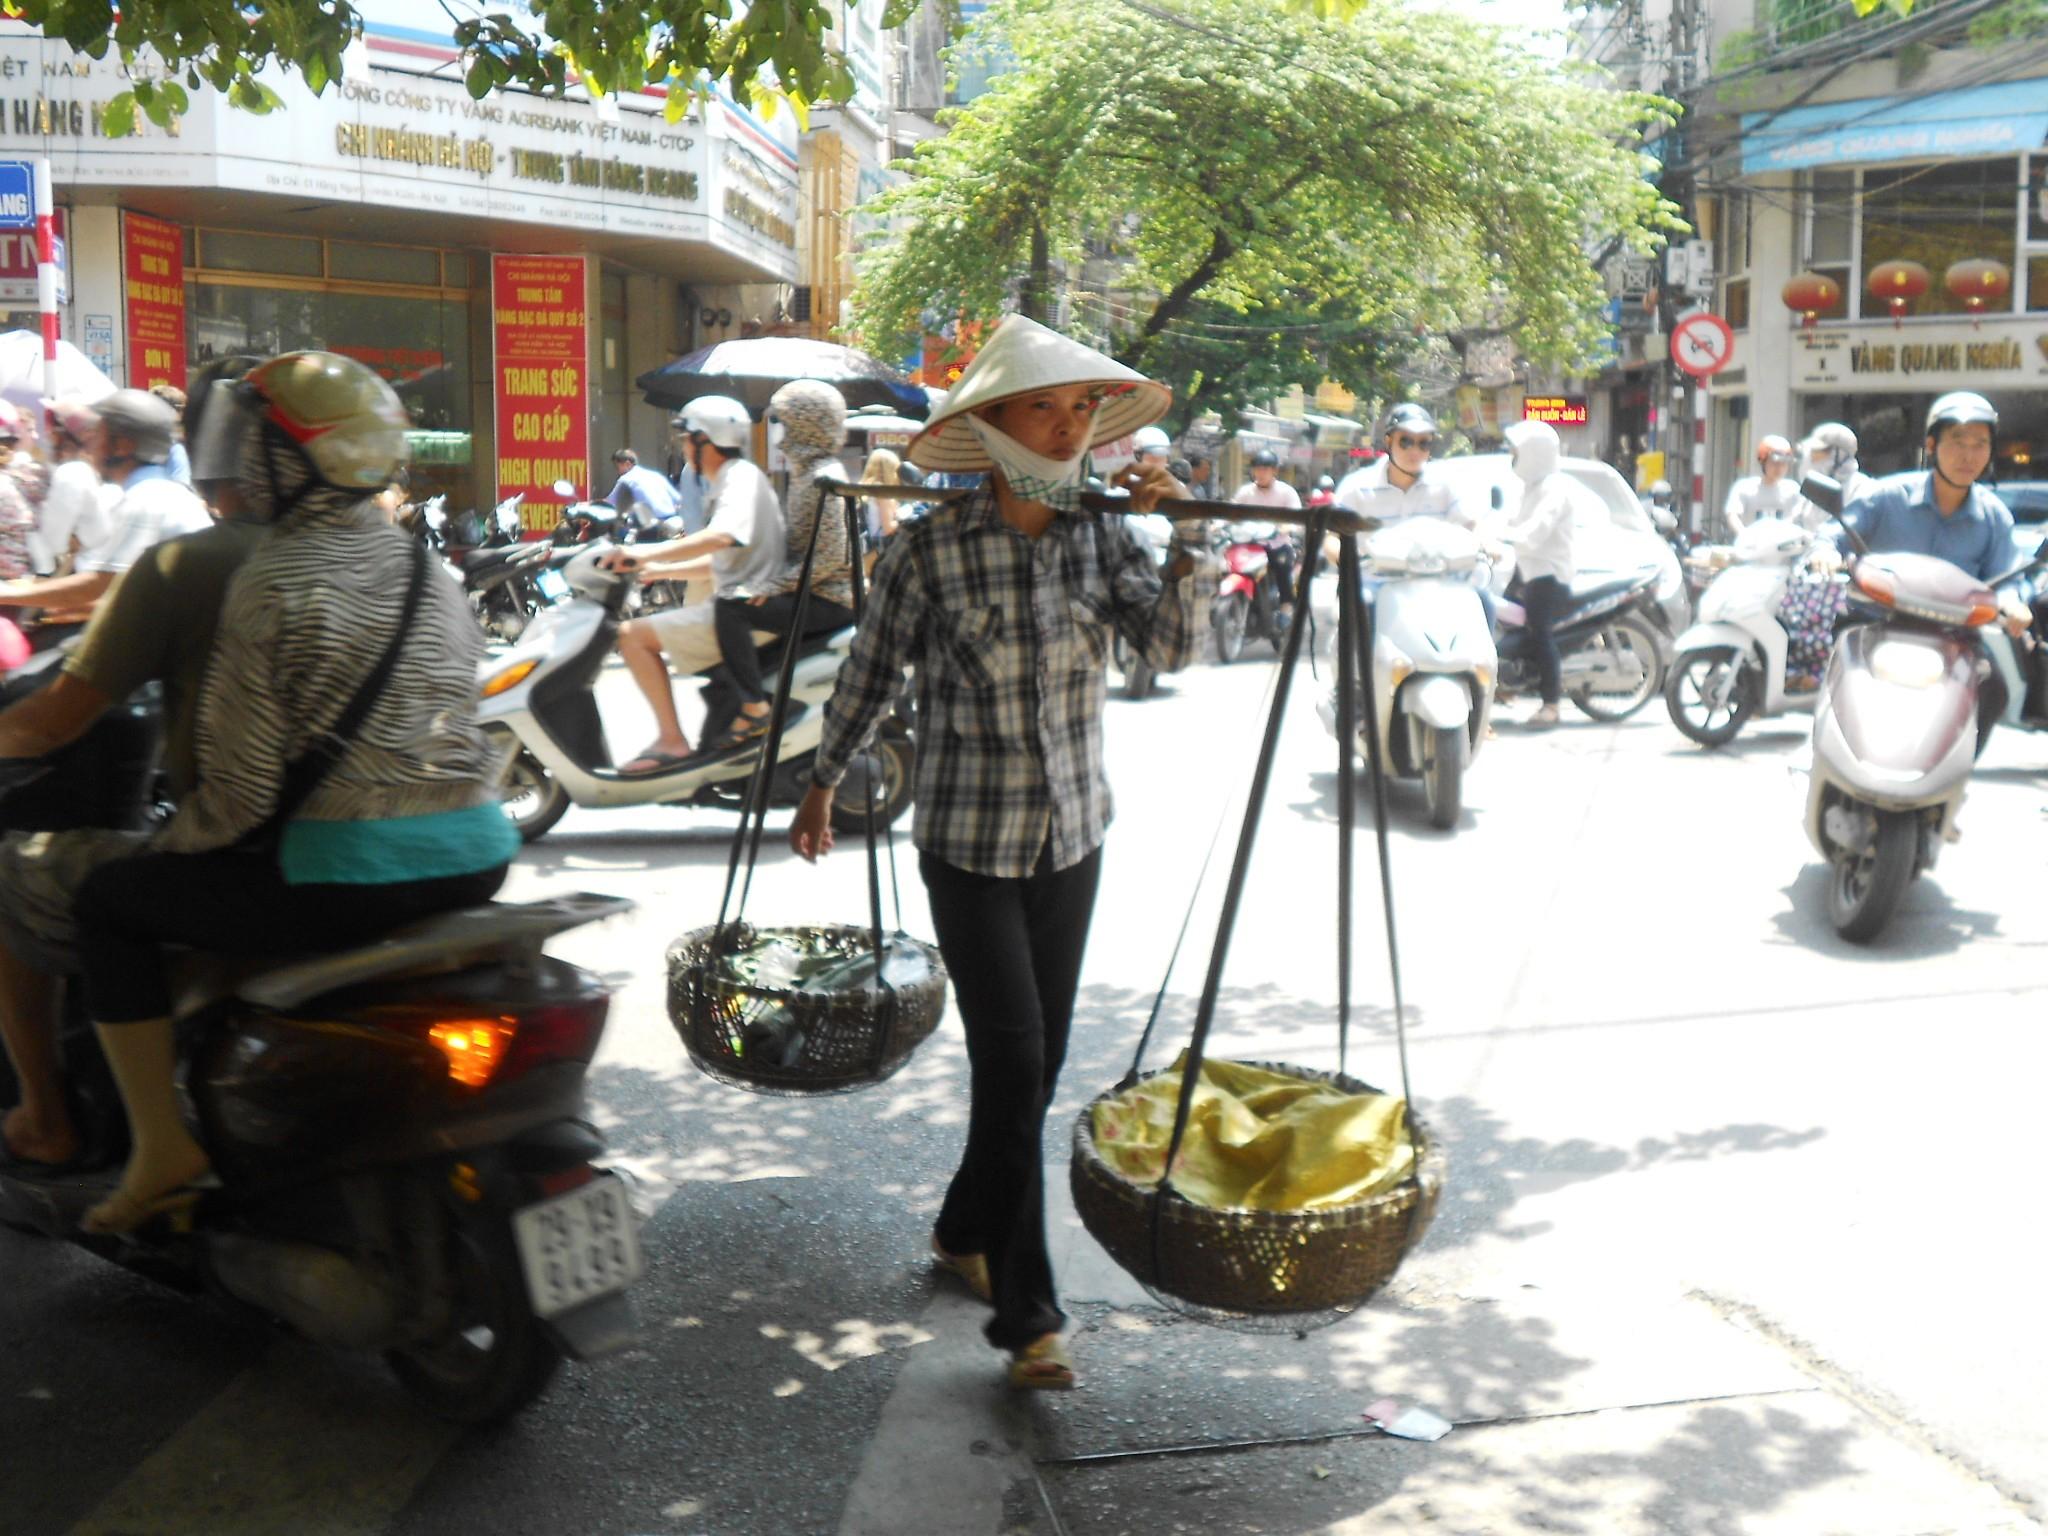 Mujer con sombrero cónico y pértiga de bambú con dos cestos